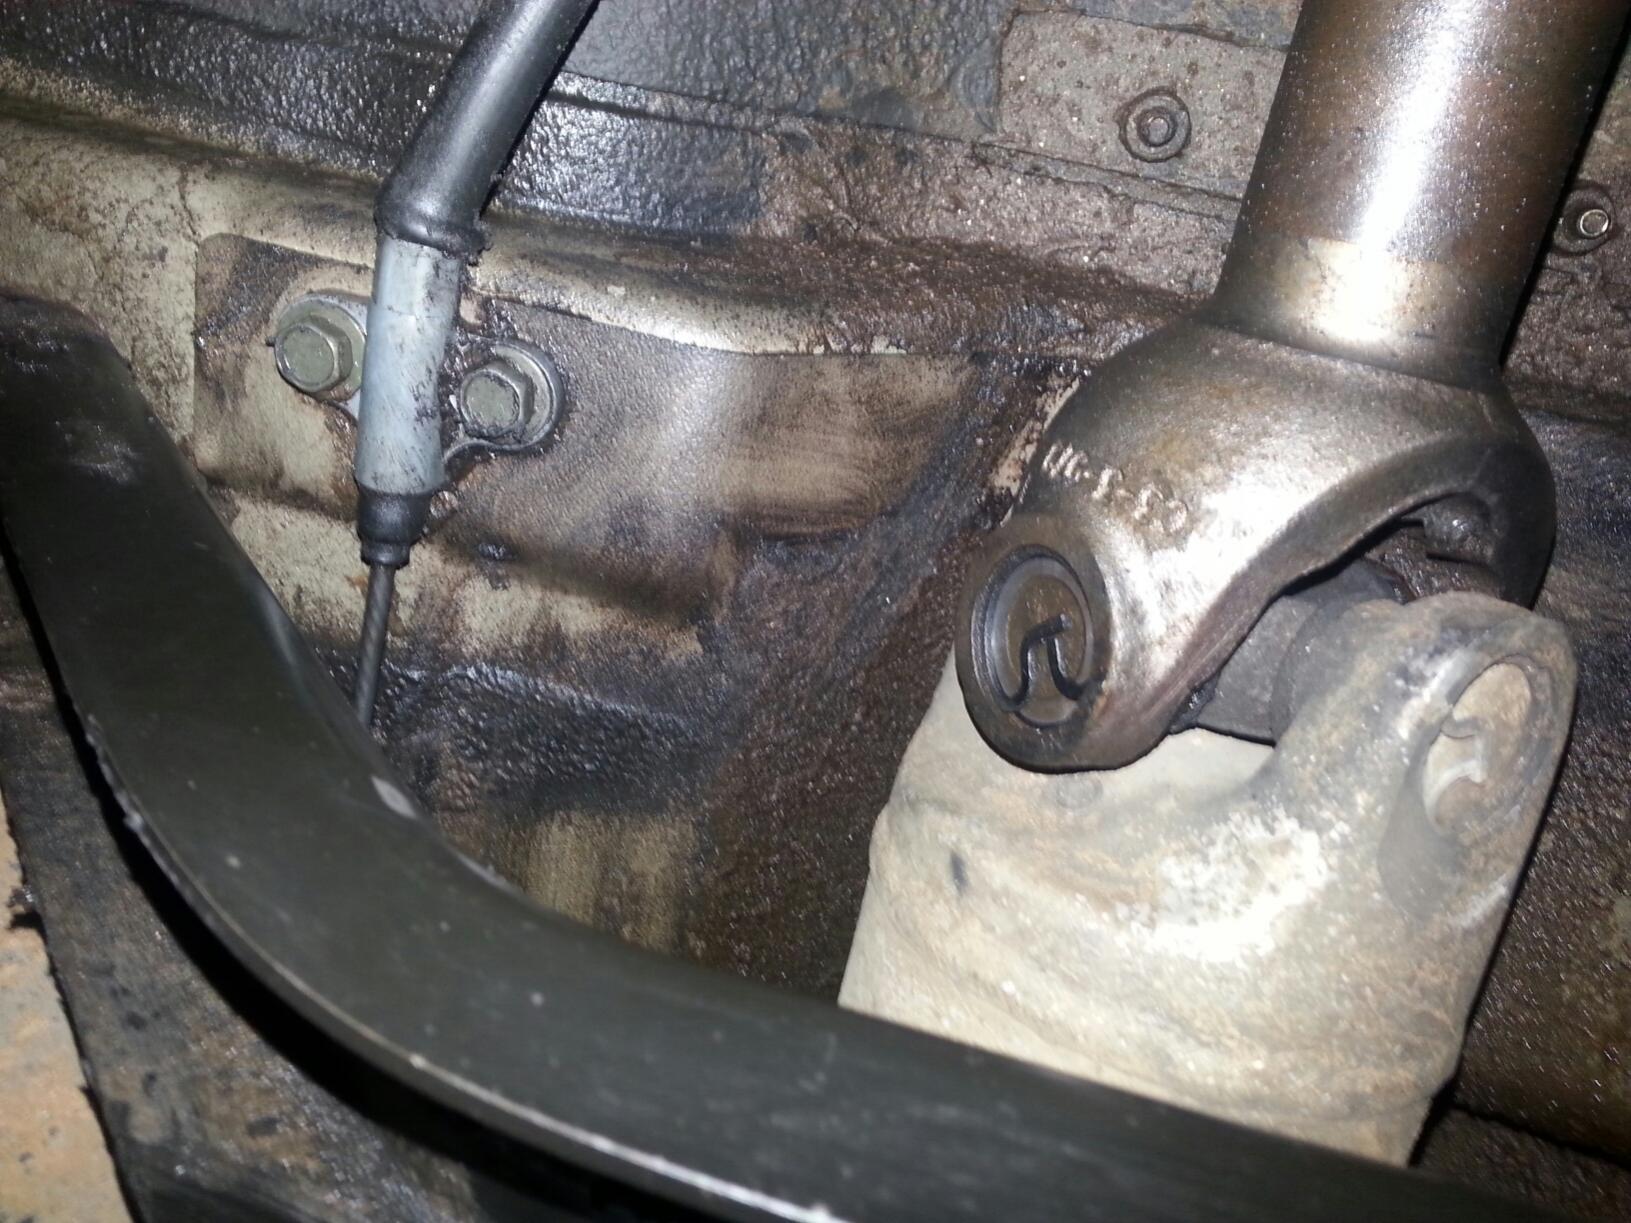 Fluid leak-fluid-leak-1.jpg